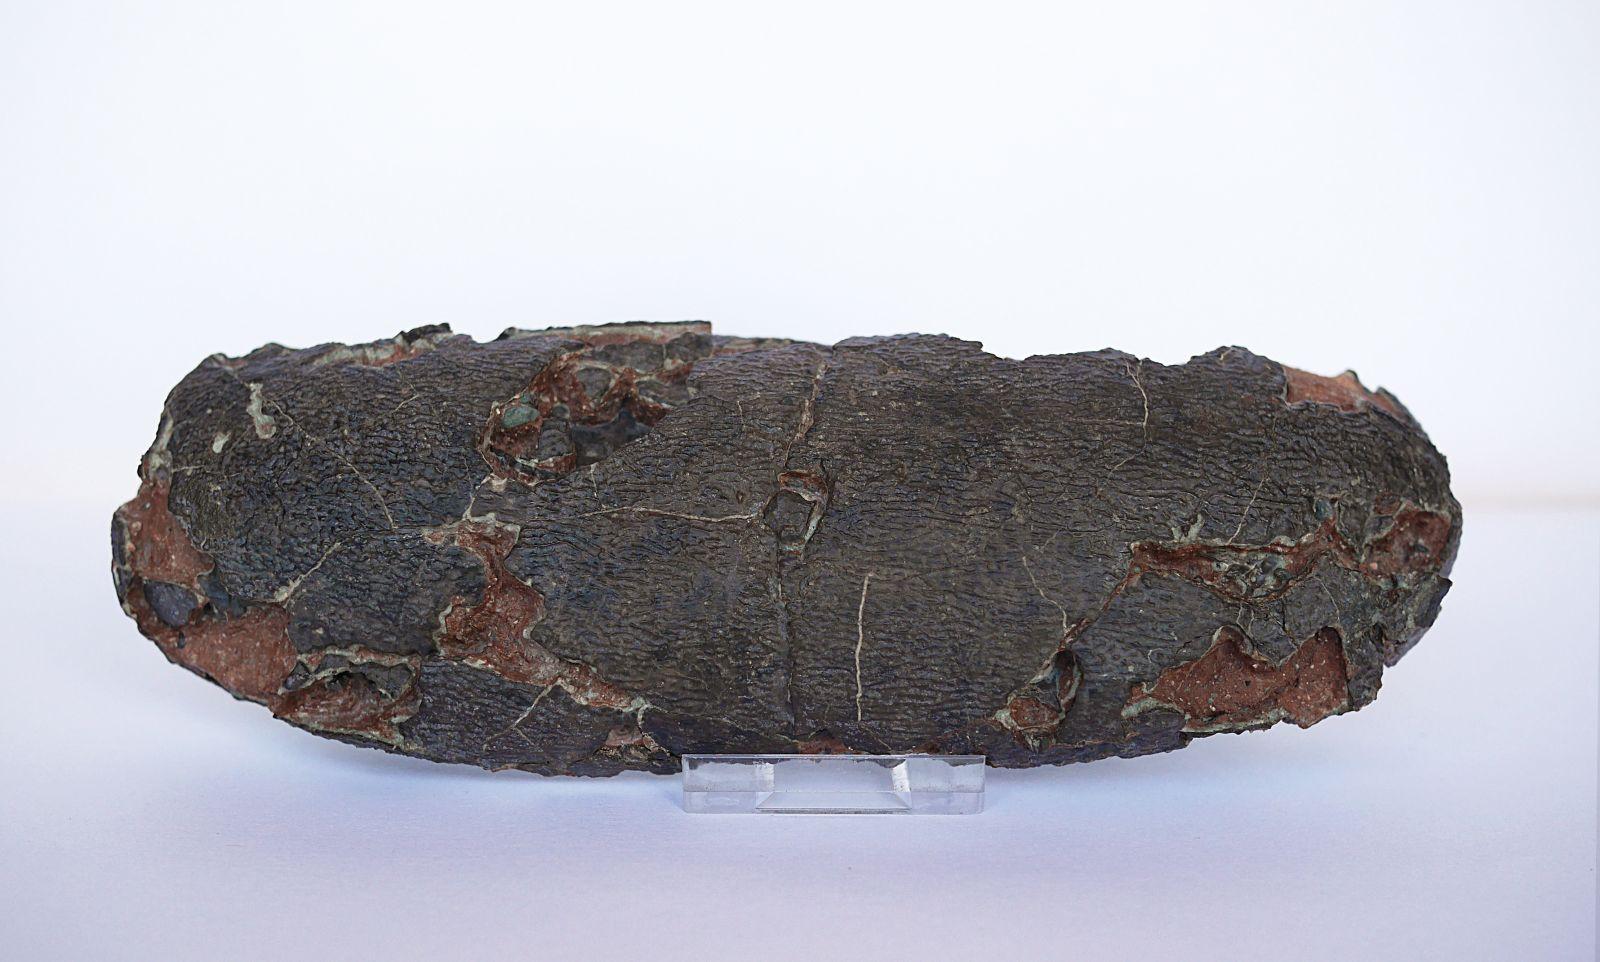 Oviraptor Egg (Elongatoolithus sp.)